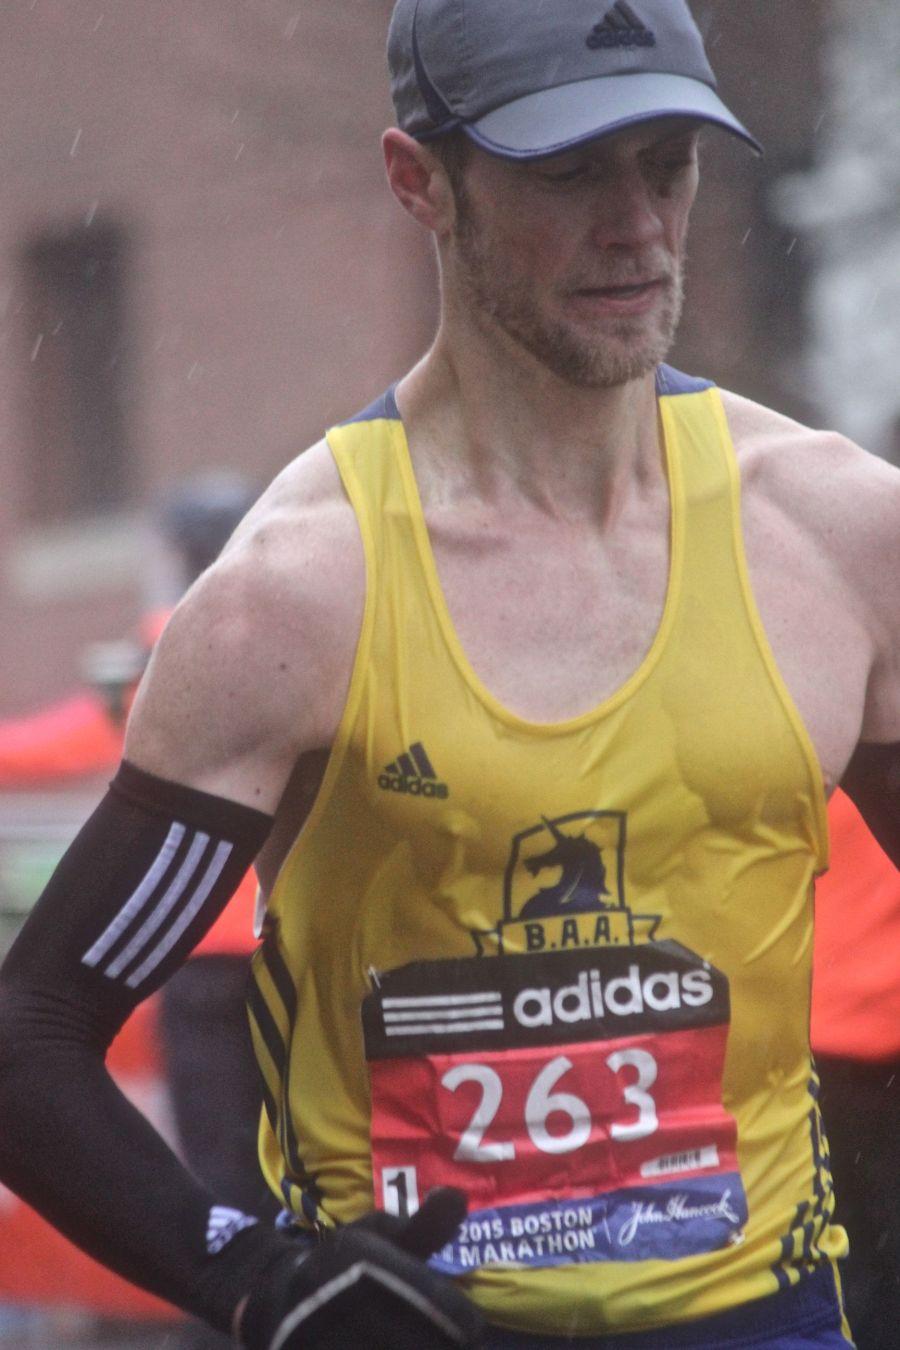 boston marathon april 20 2015 racer number 263 rain